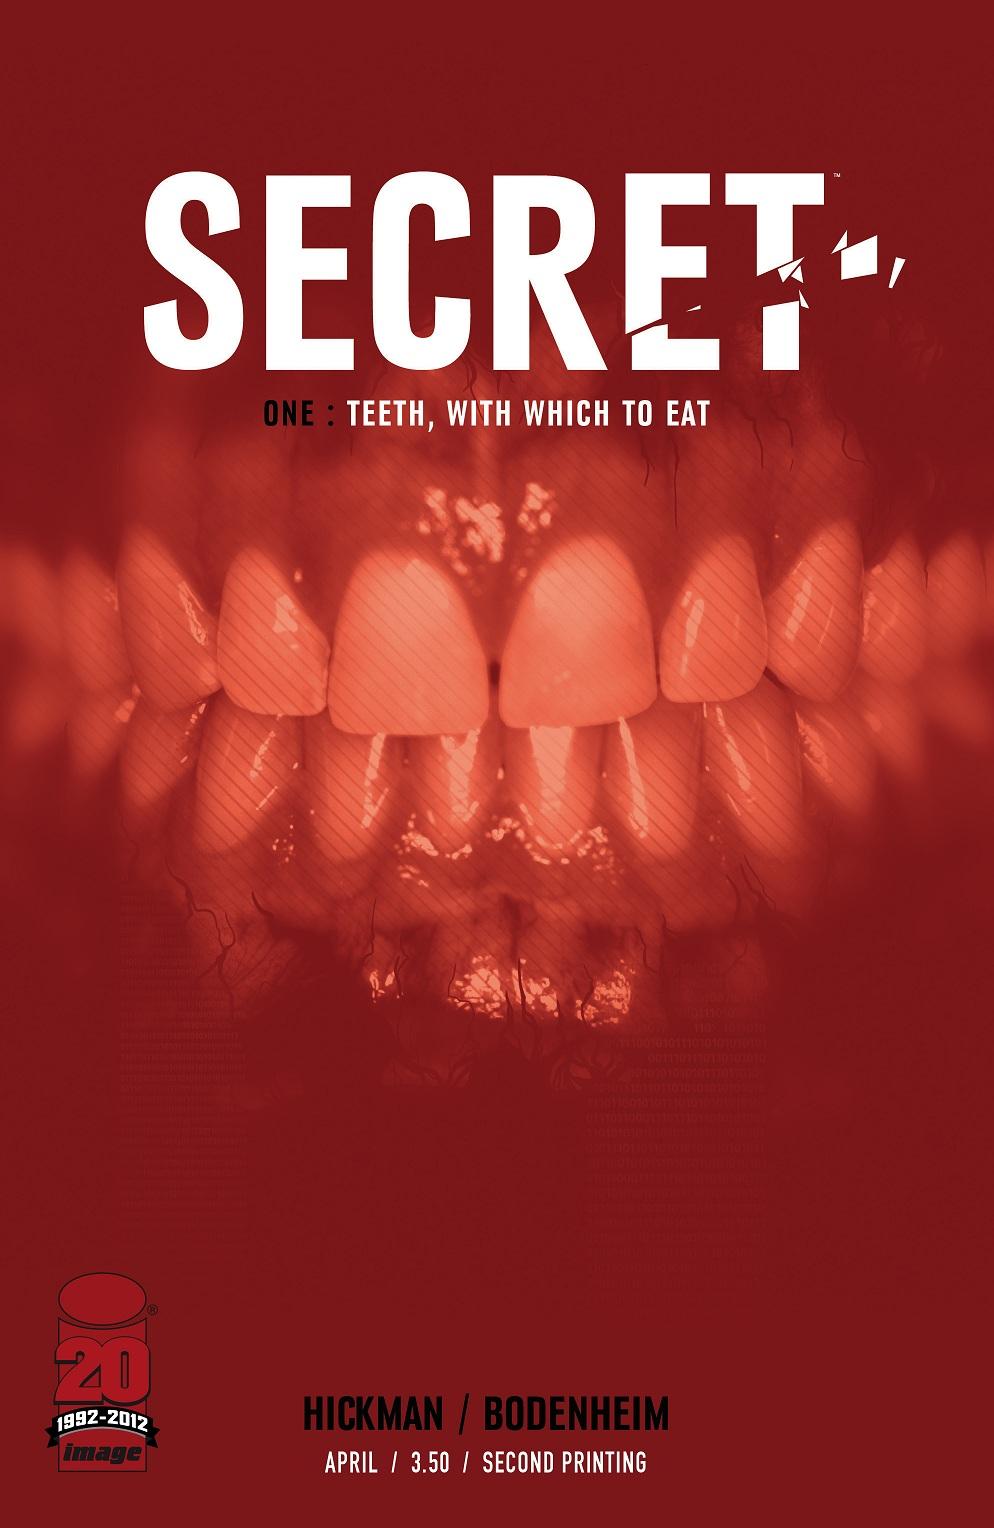 929482309971254 Jonathan Hickman's SECRET gets 2nd printing